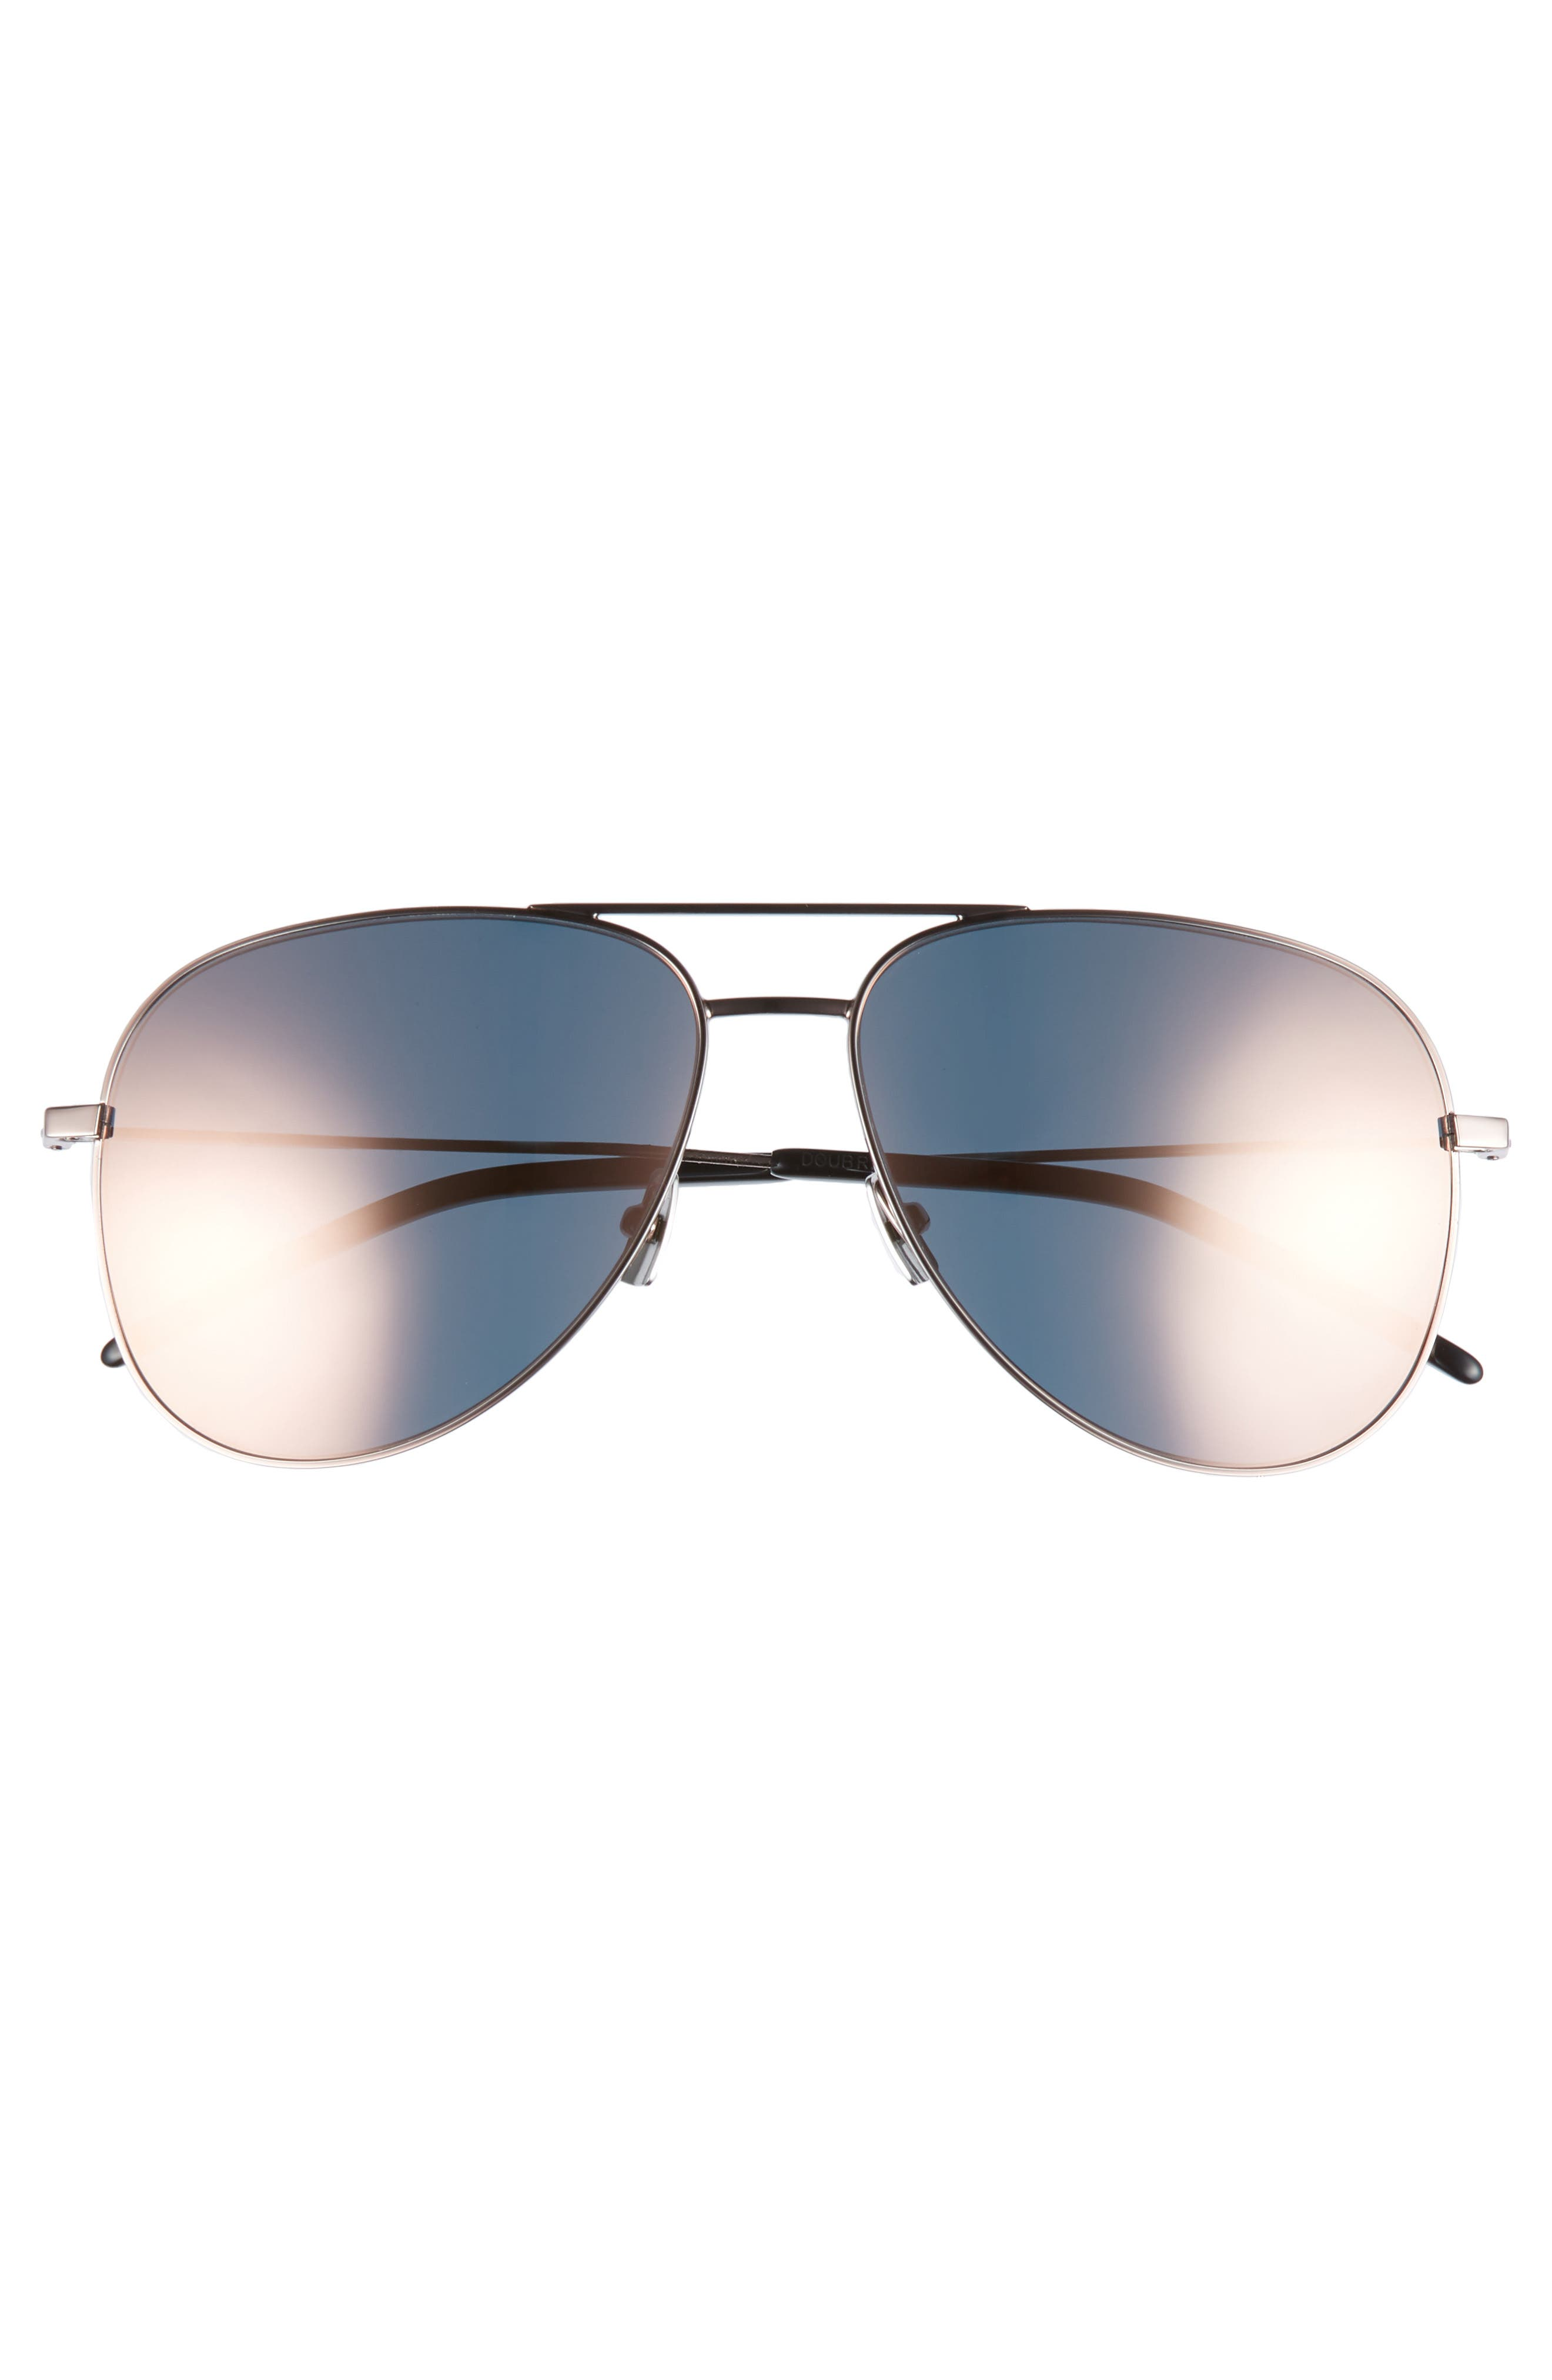 59mm Brow Bar Aviator Sunglasses,                             Alternate thumbnail 3, color,                             250